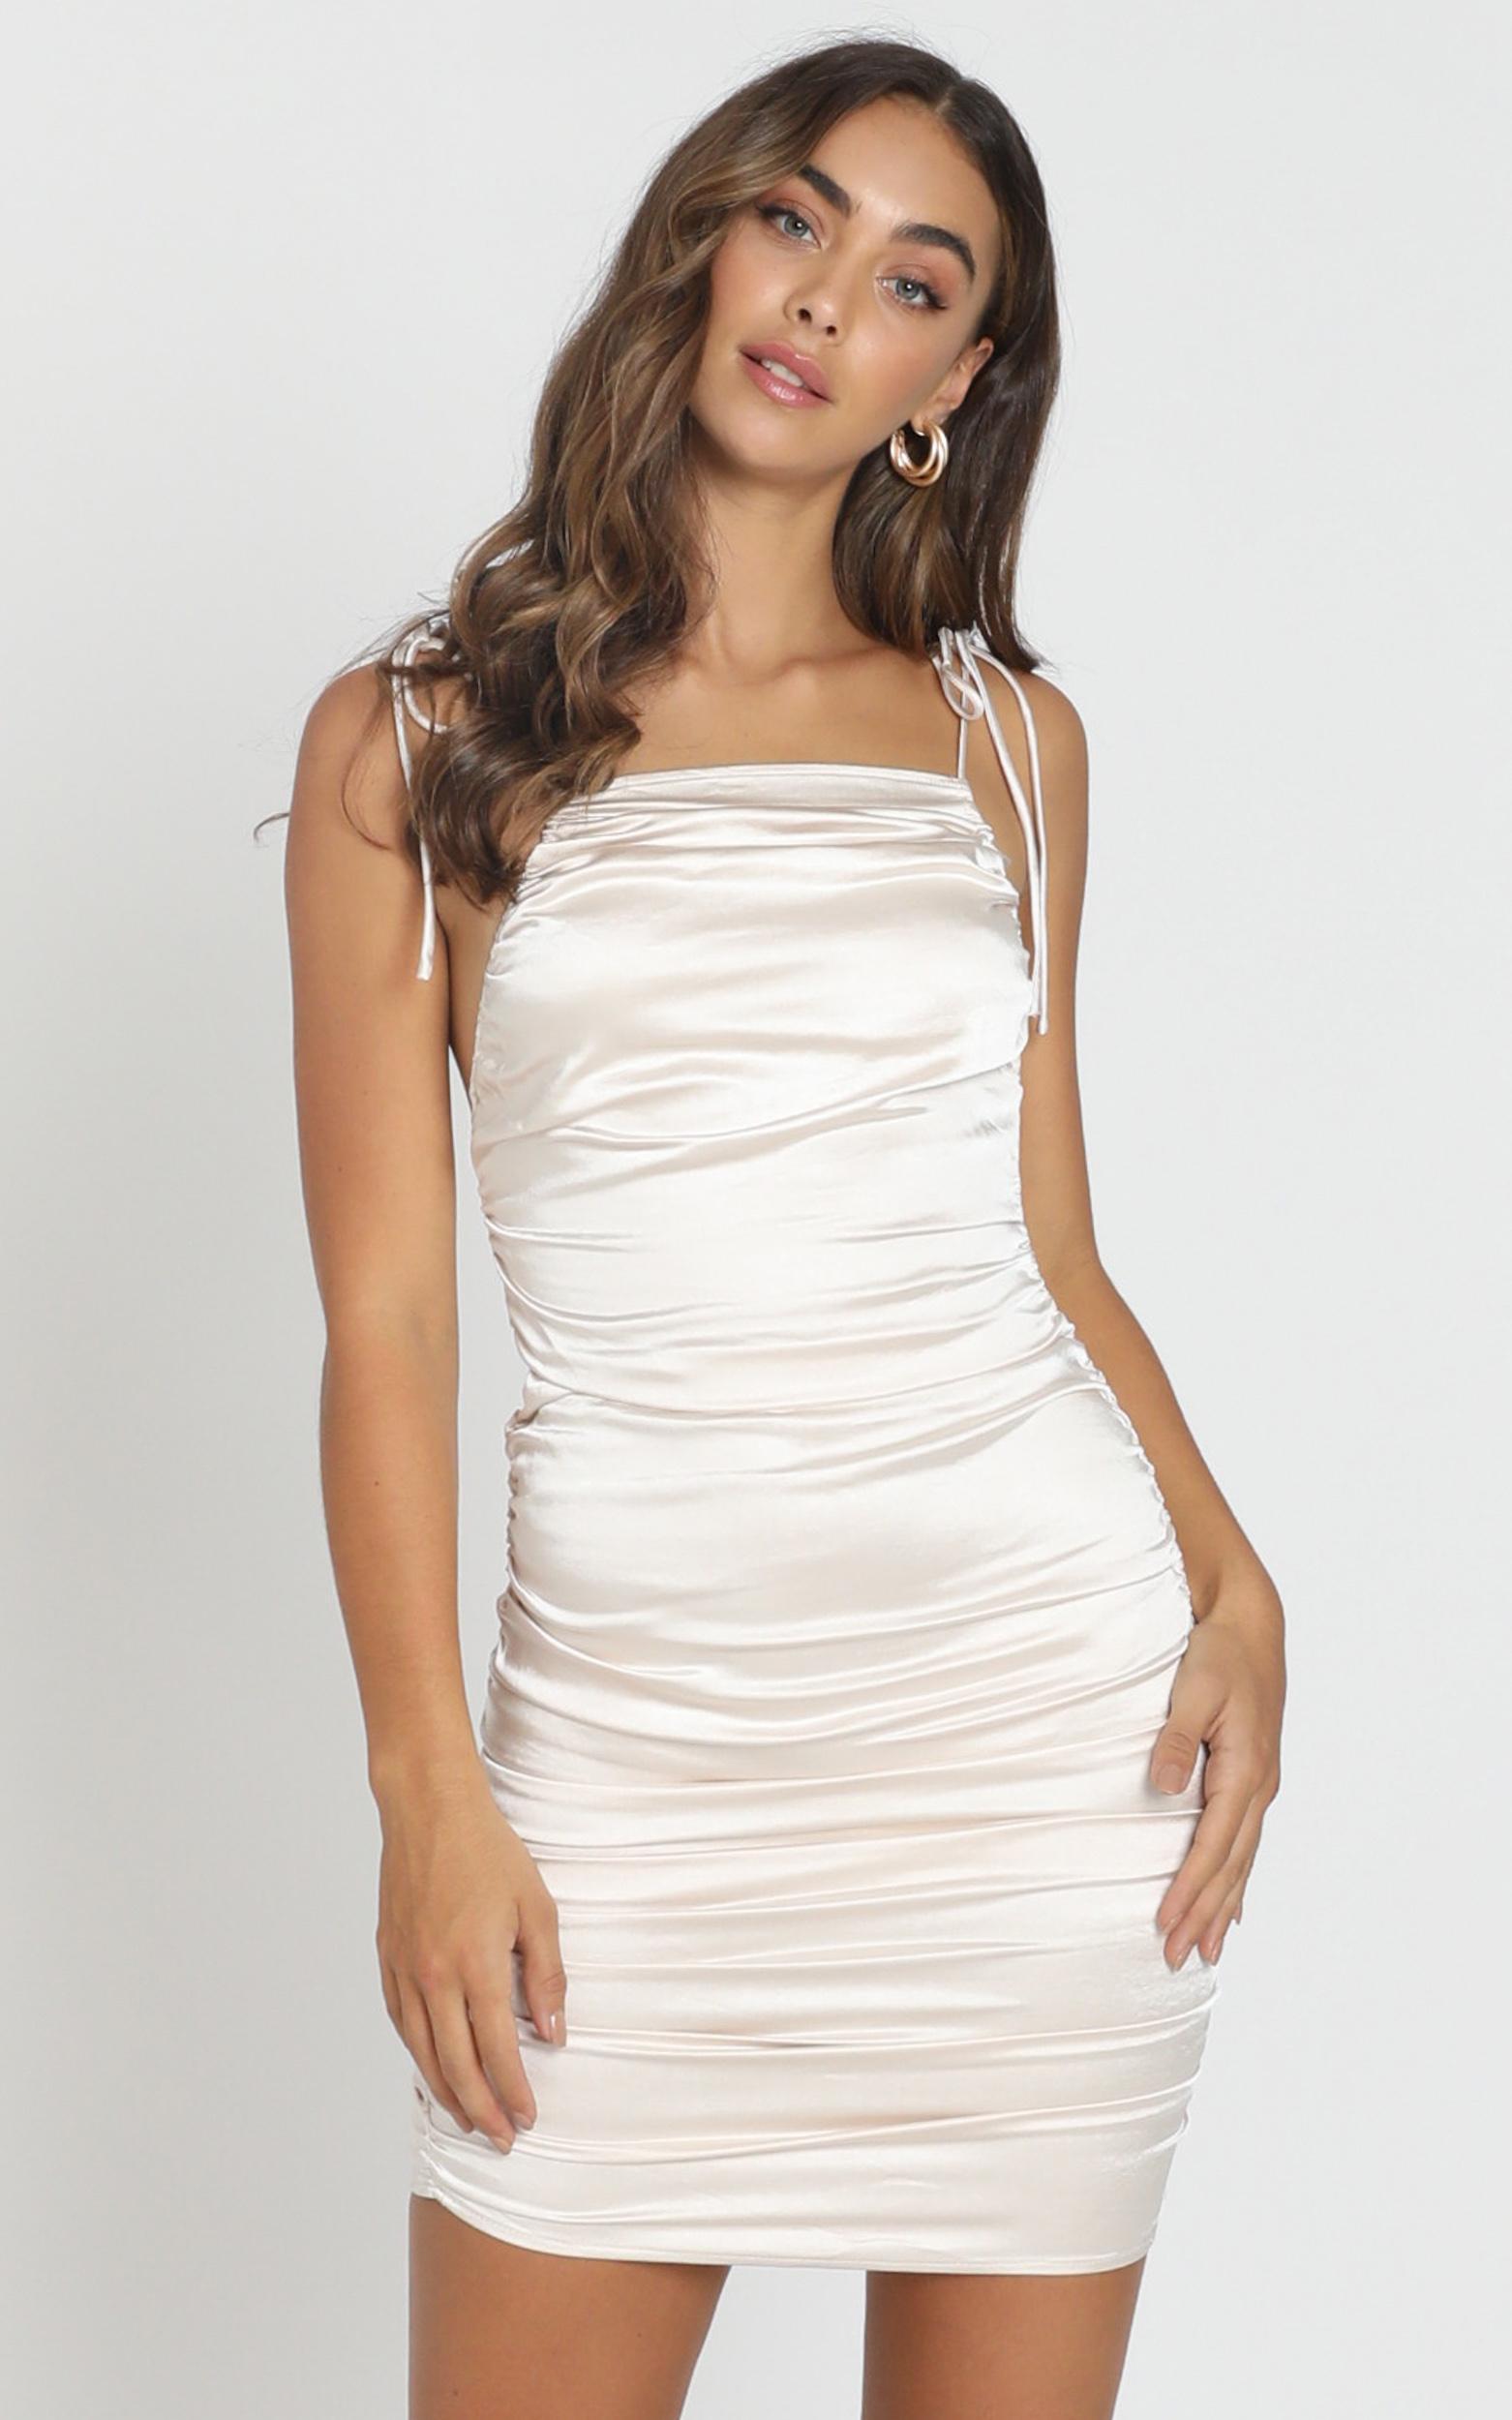 Lioness - Wild Wild West dress in cream satin - 6 (XS), Cream, hi-res image number null